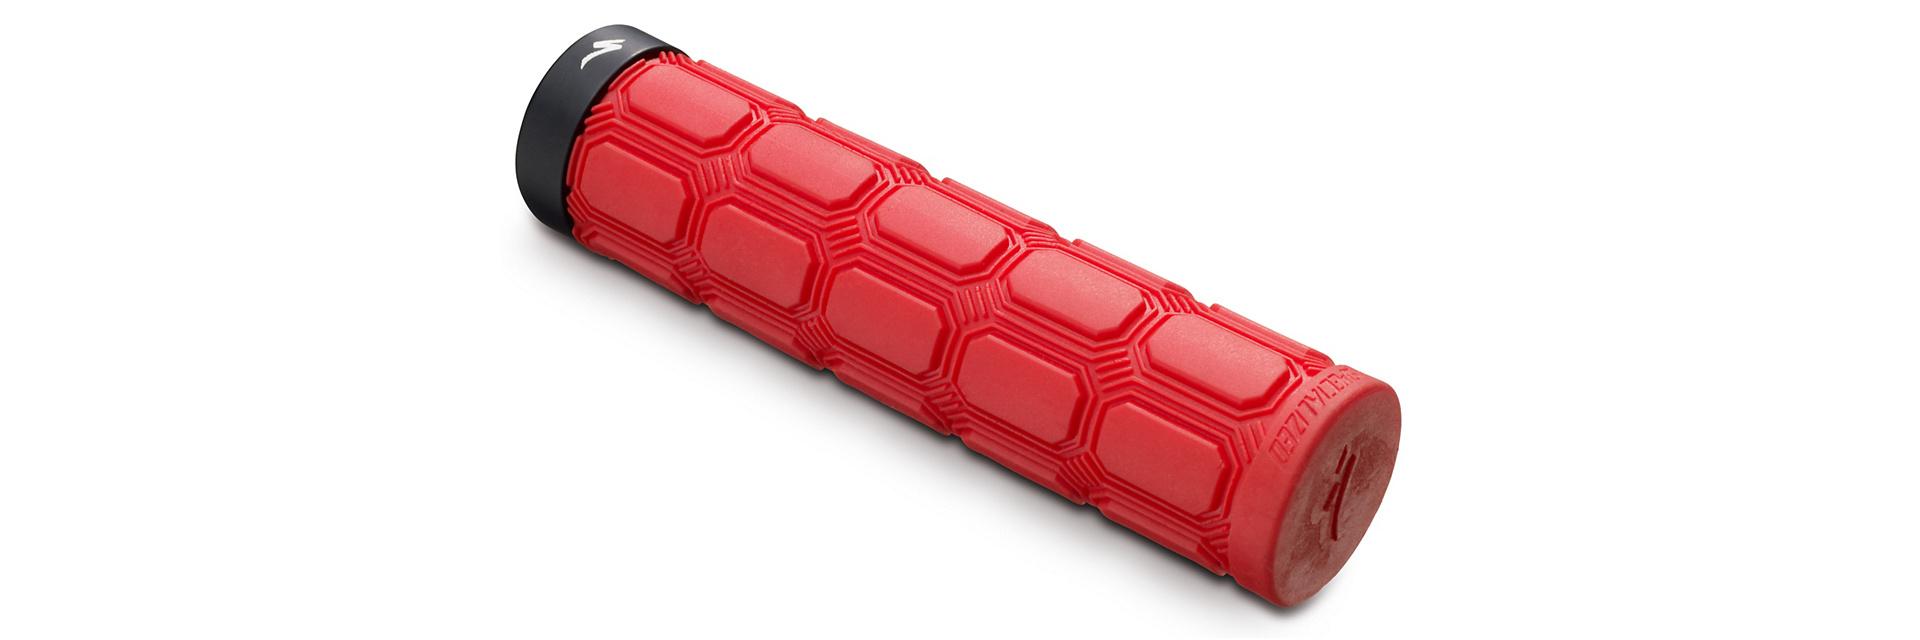 Specialized ENDURO XL LOCKING GRIP - Red .